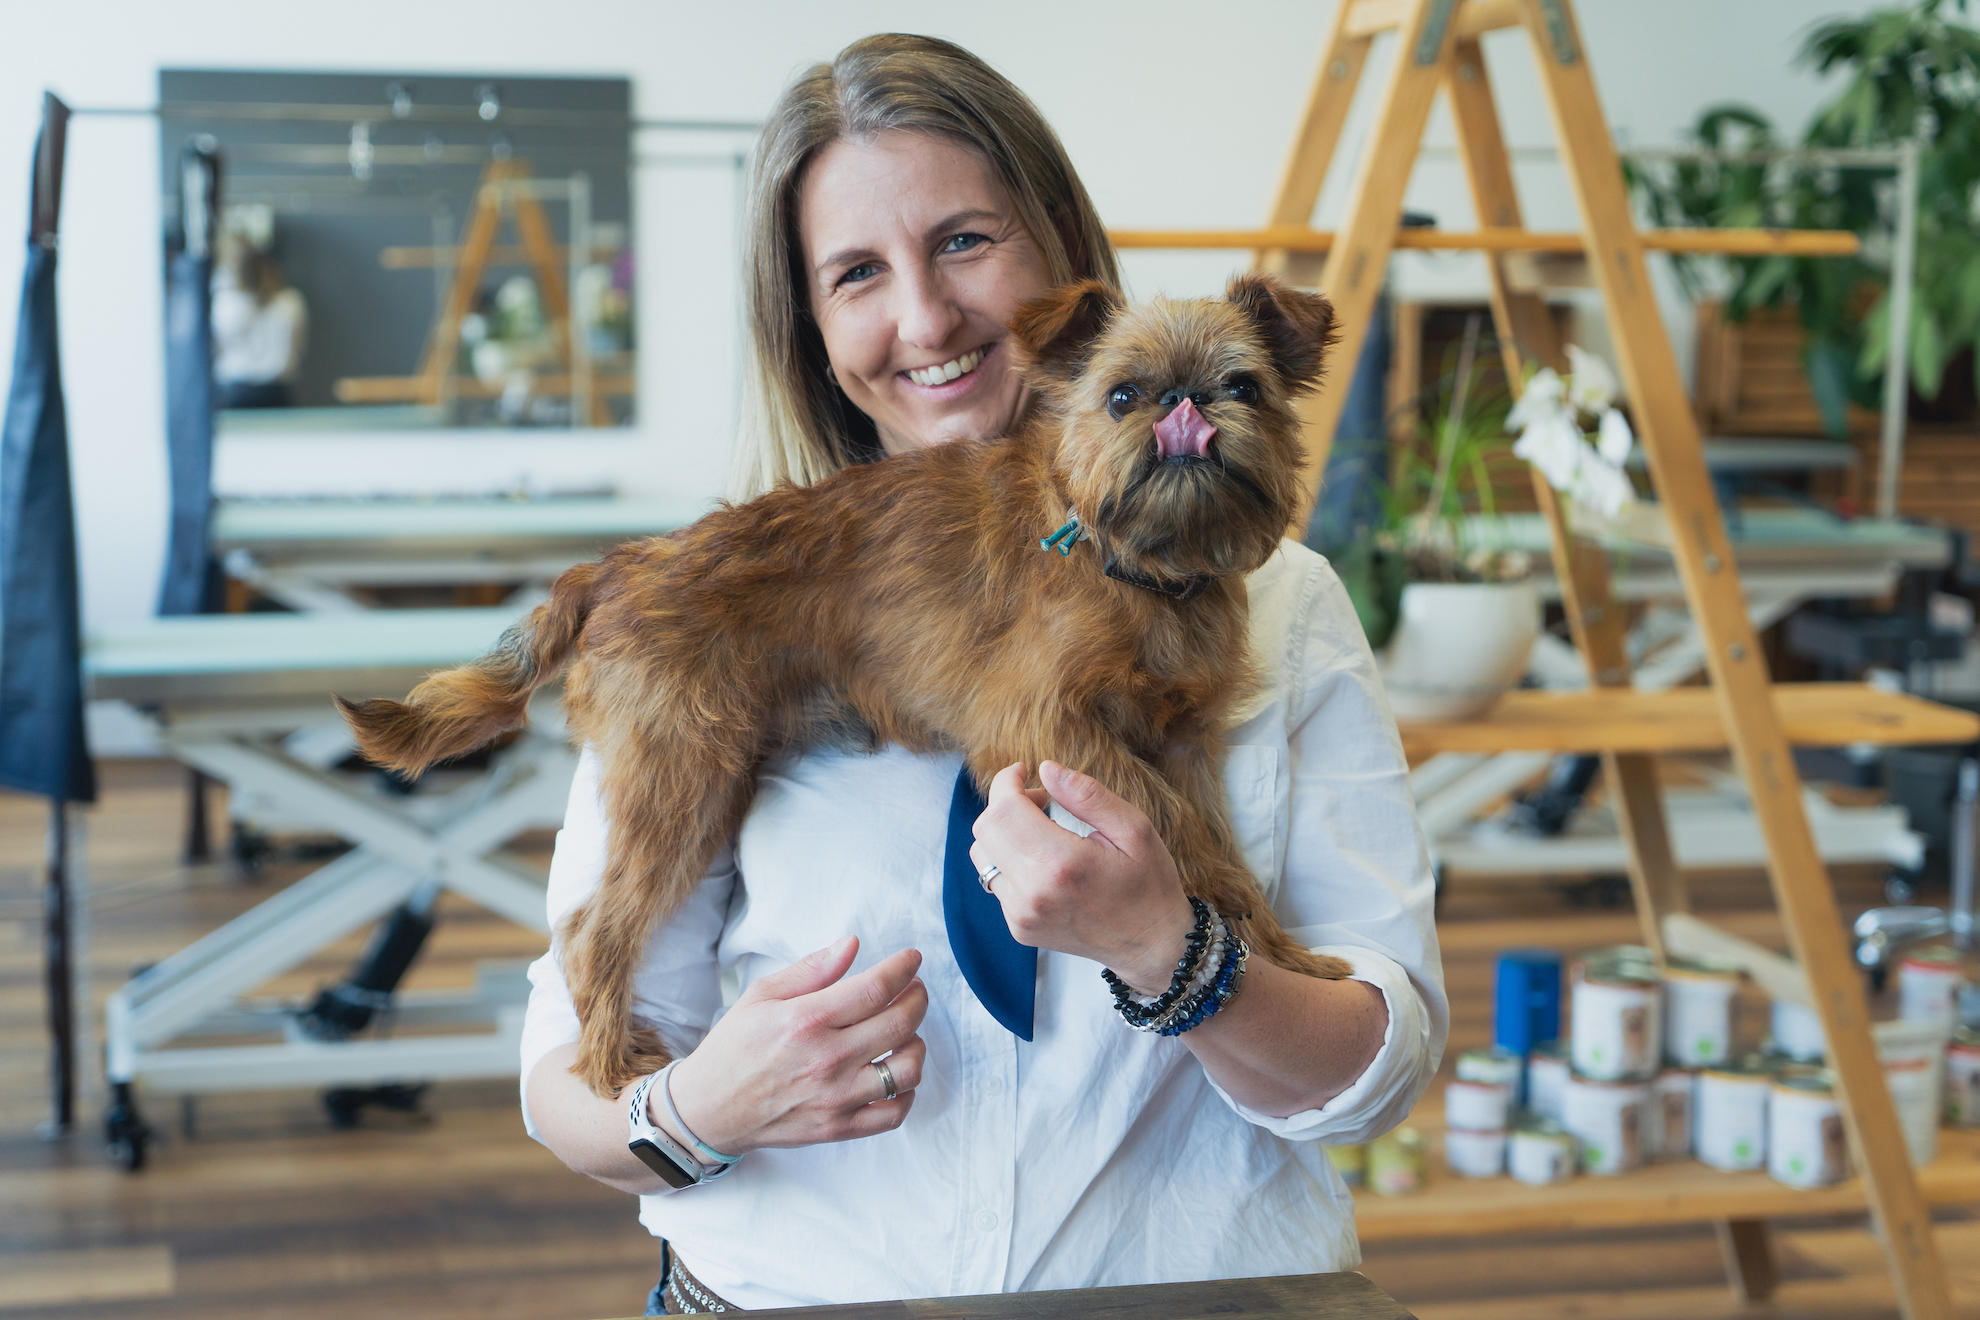 dog grooming Salon - dog center Tirol